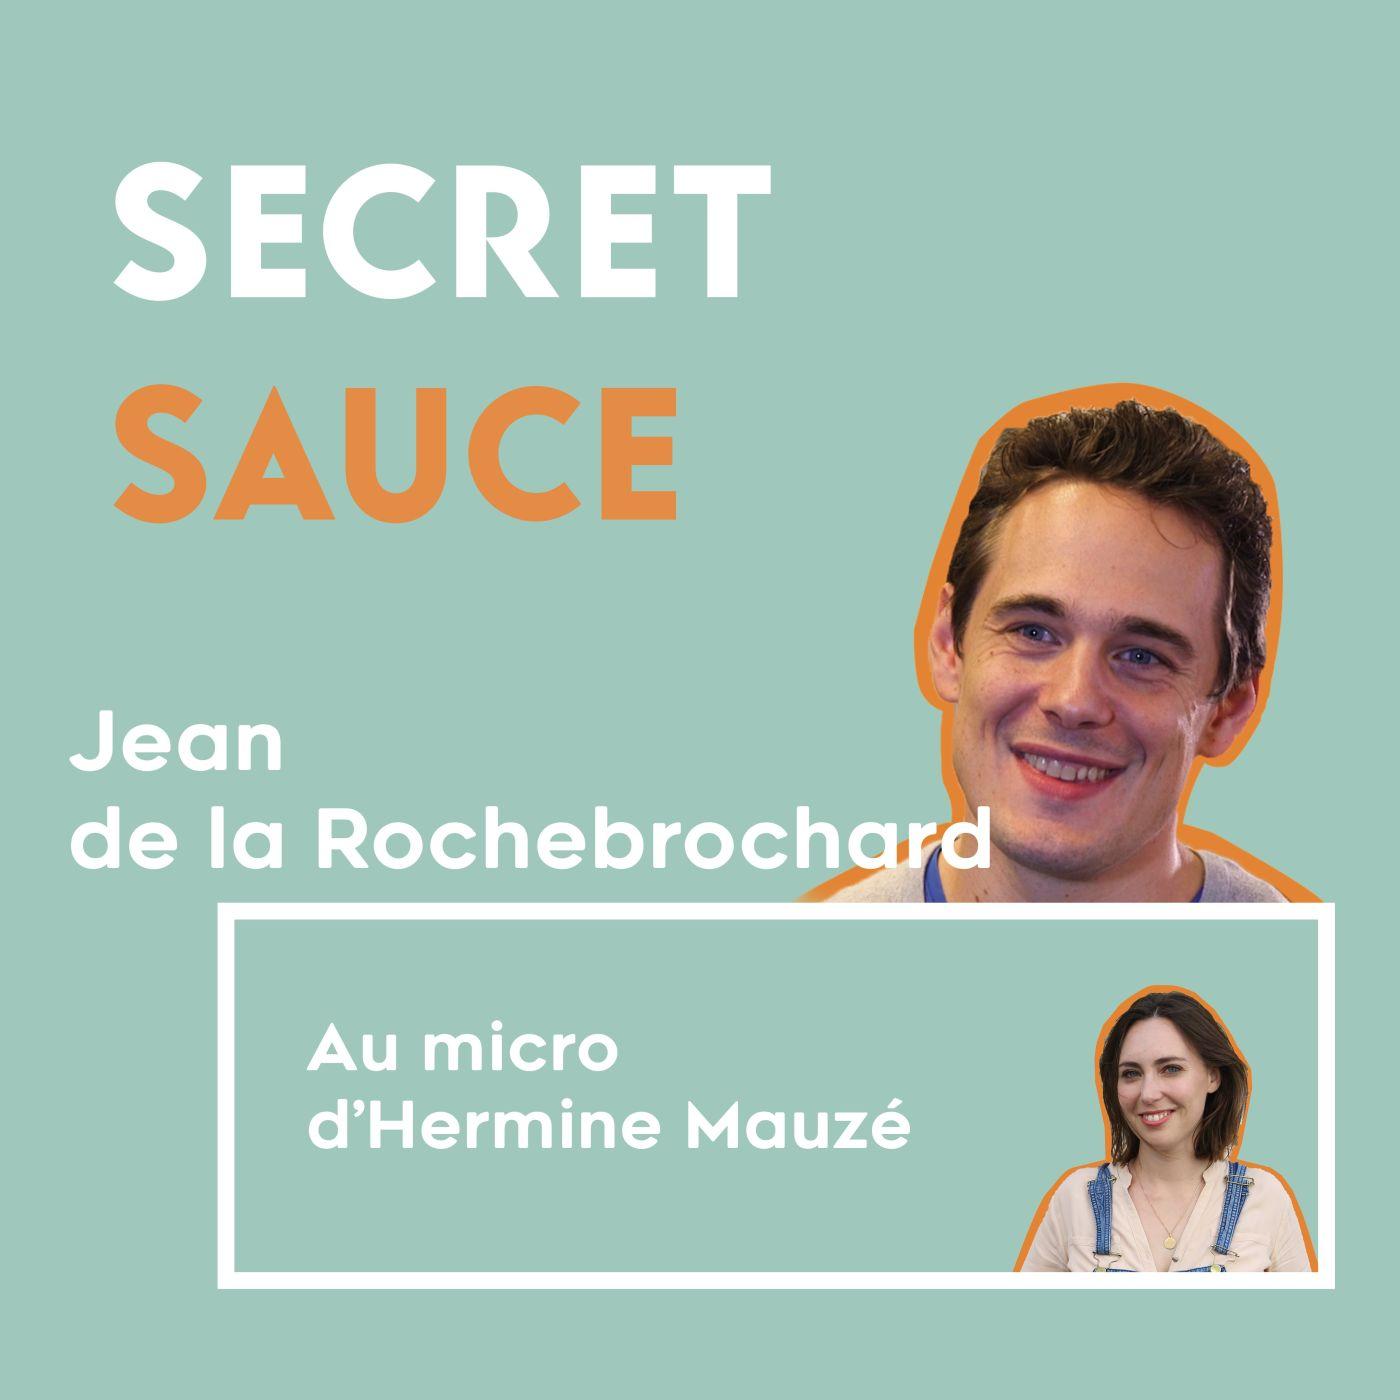 #1 Jean de La Rochebrochard ou la tête chercheuse de Xavier Niel